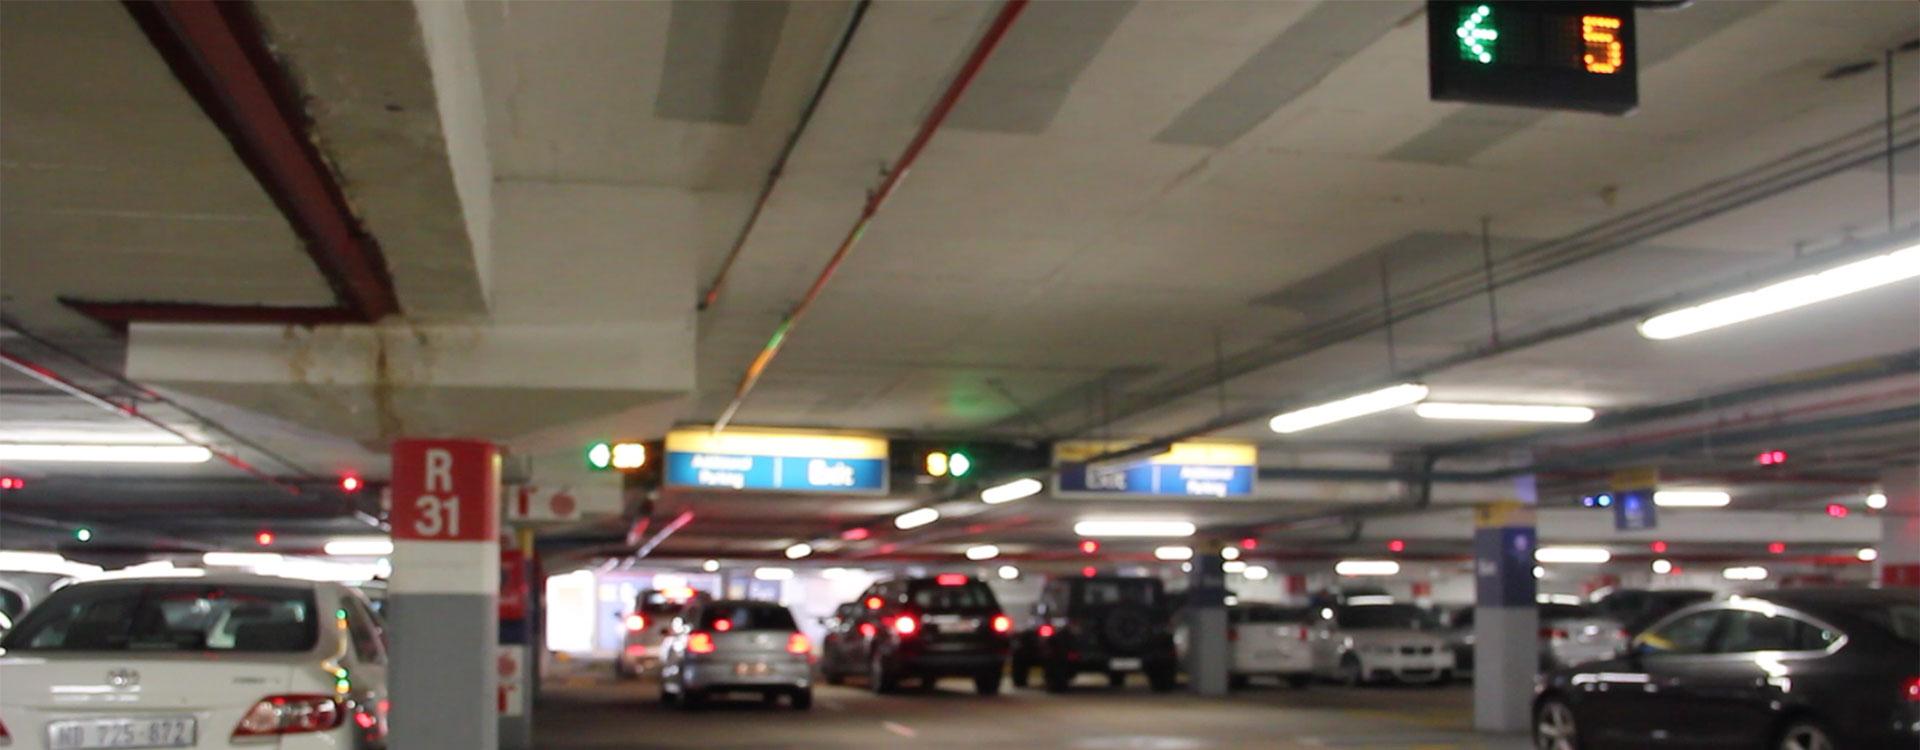 Glance Parking